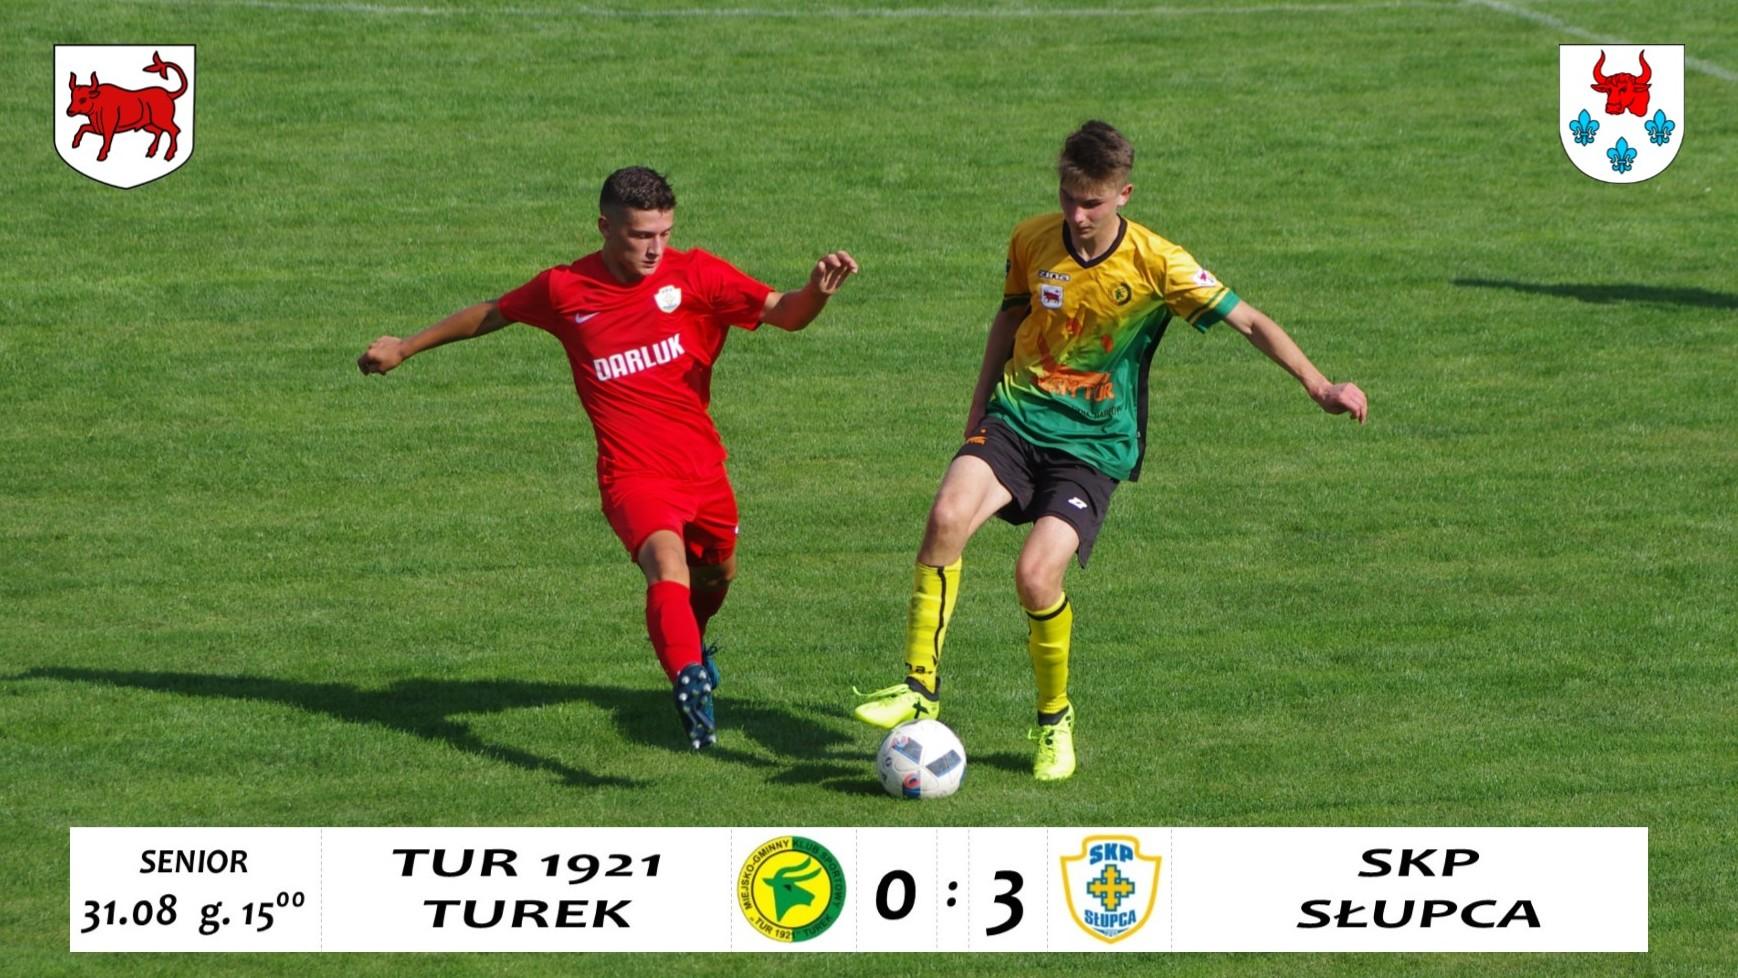 Tur 1921 Turek- SKP Słupca 0:3